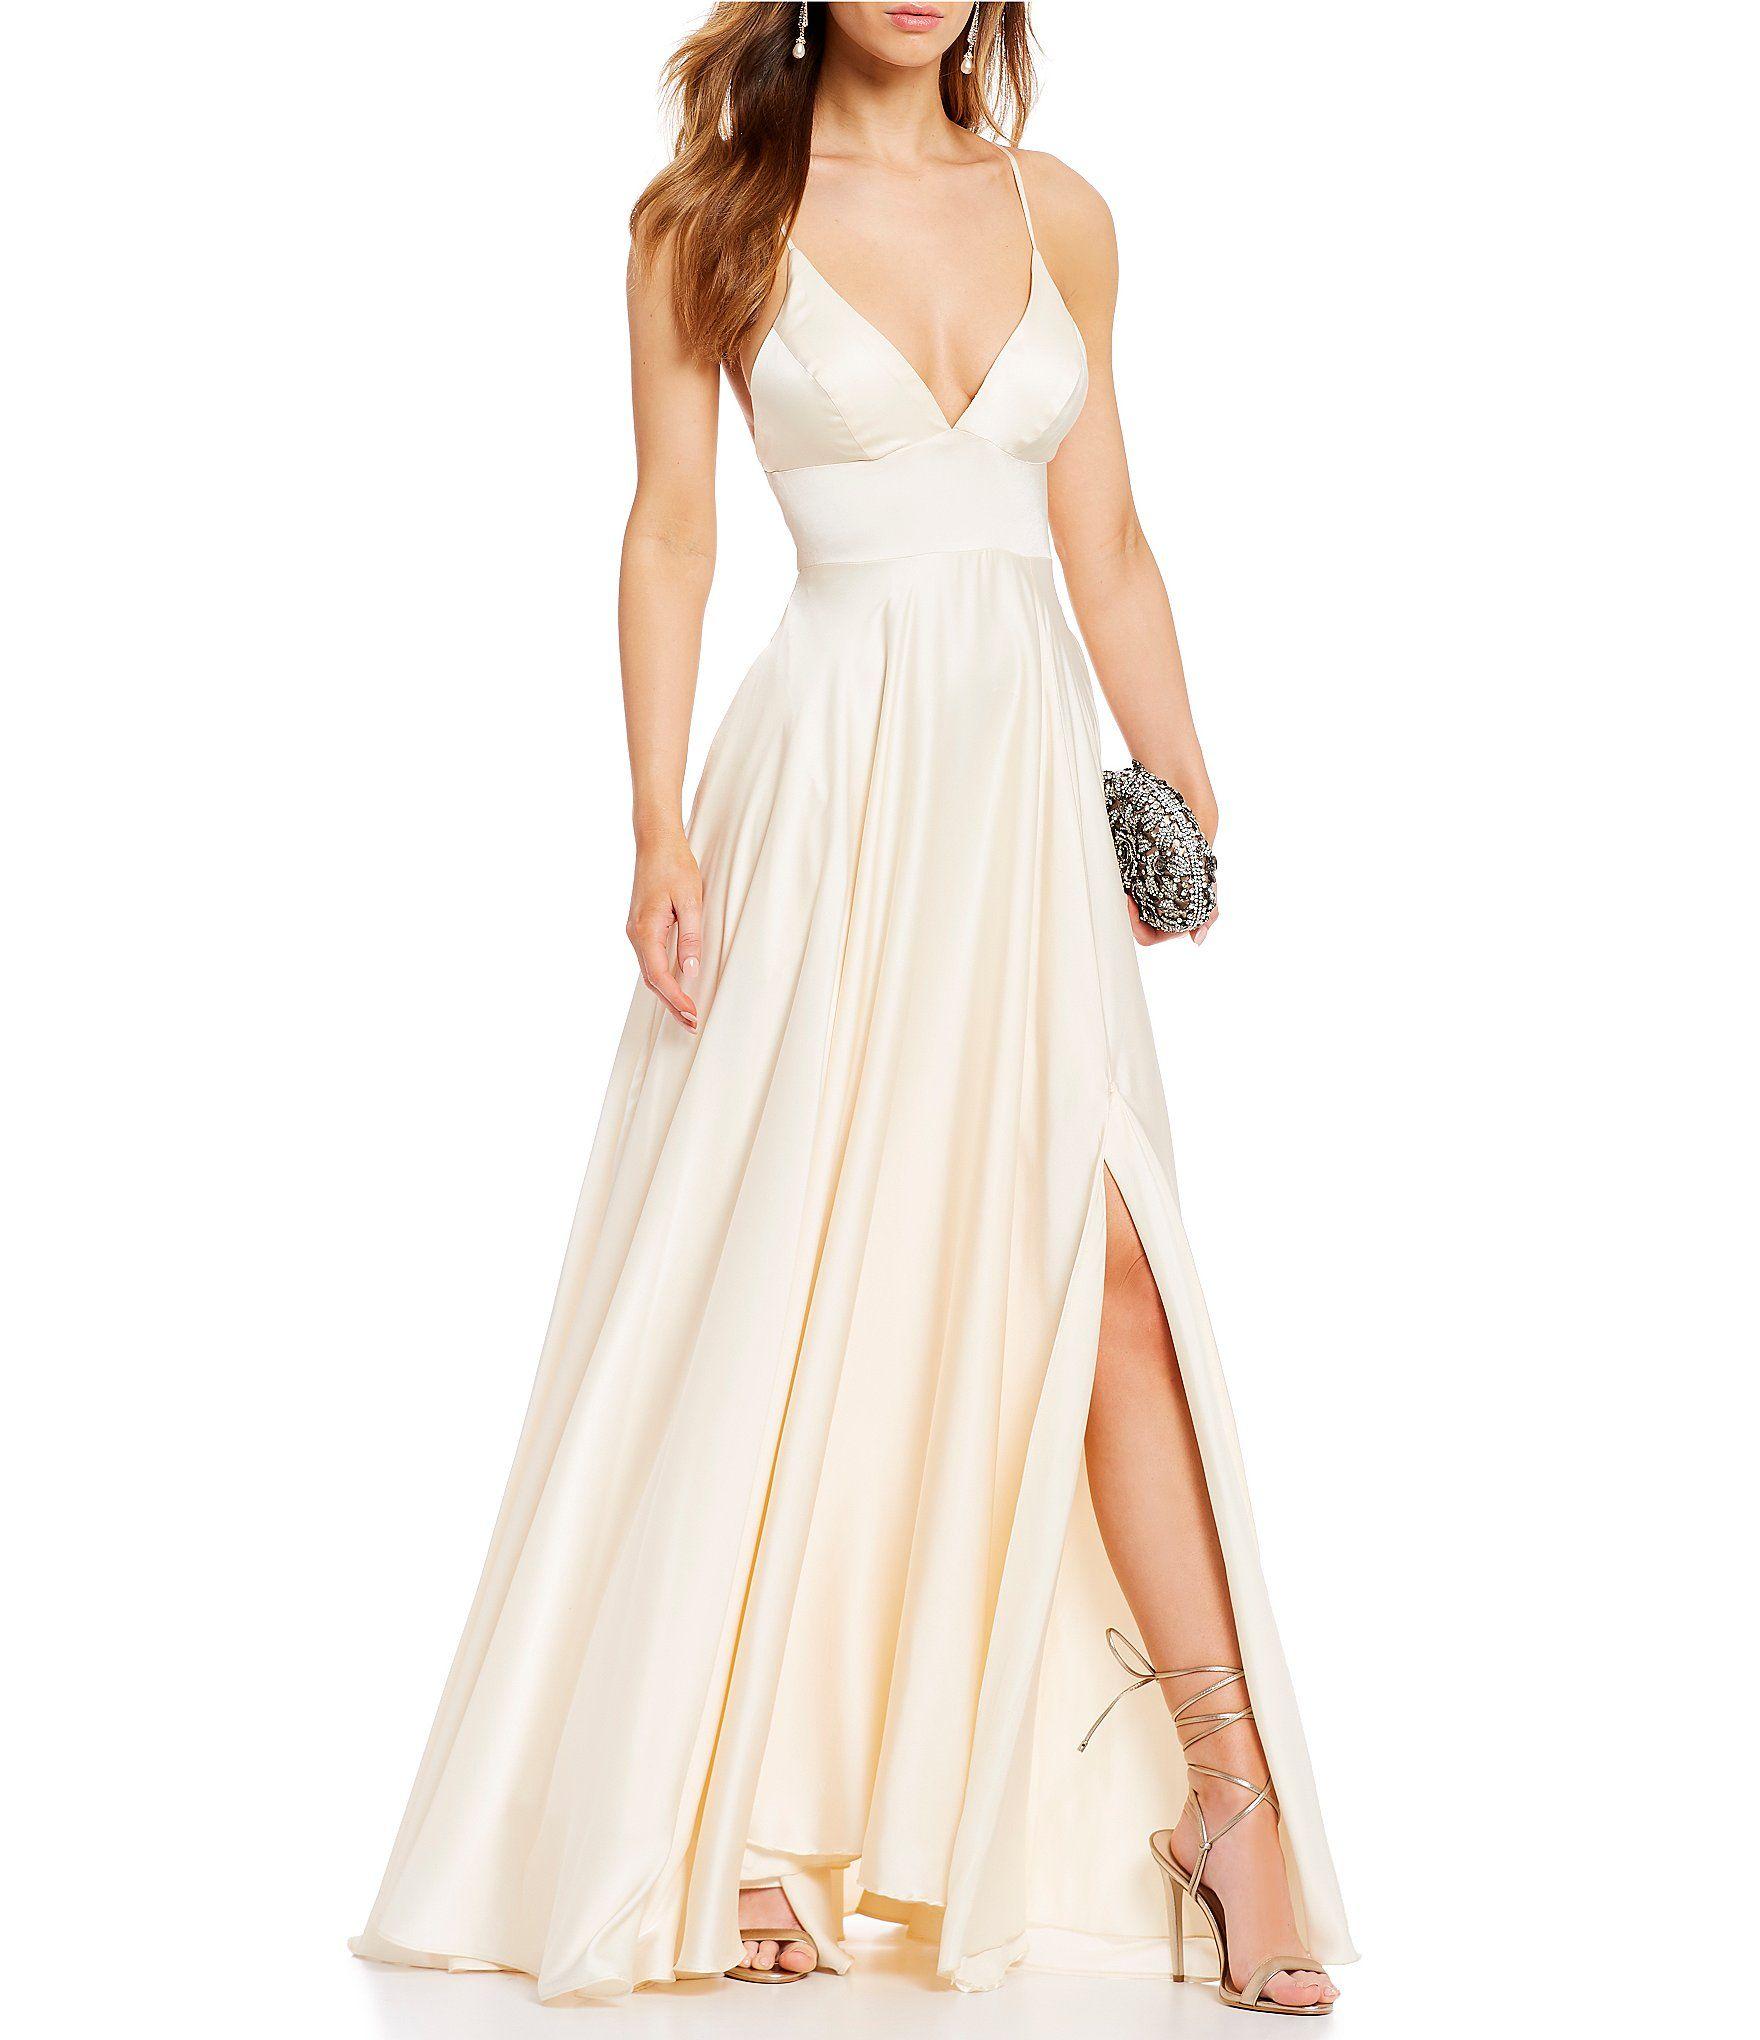 2b66b1df69f Shop for B. Darlin Deep V-Neck Satin A-Line Dress at Dillards.com. Visit  Dillards.com to find clothing